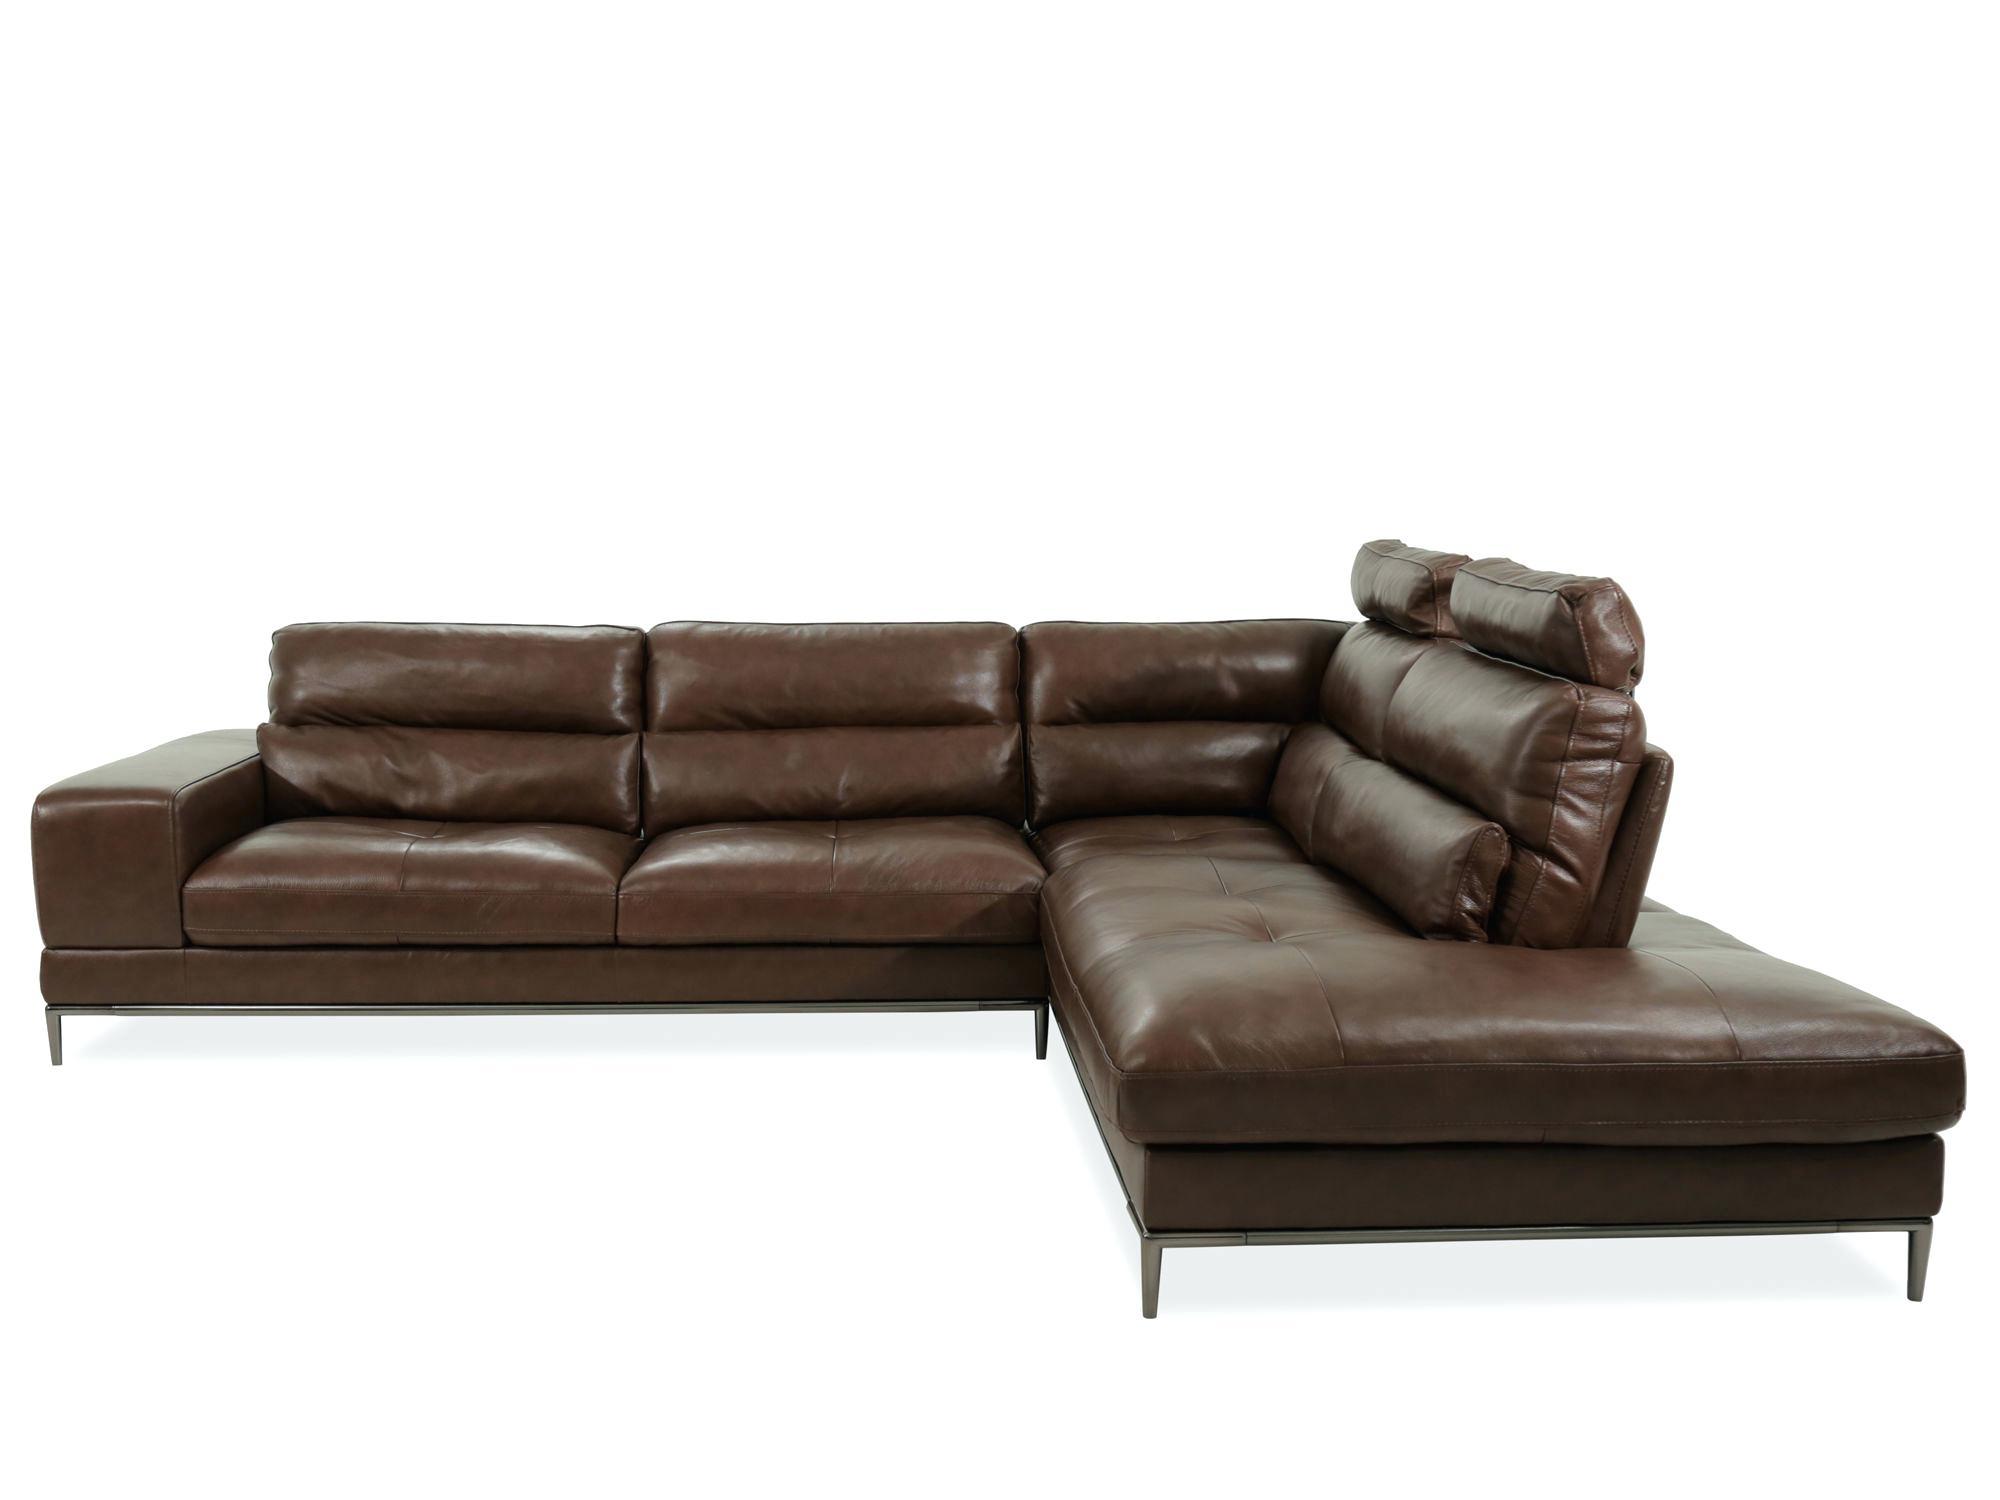 Sofa : The Sofa Company Good Quality Sectional Sofas High Quality With Quality Sectional Sofas (View 9 of 10)